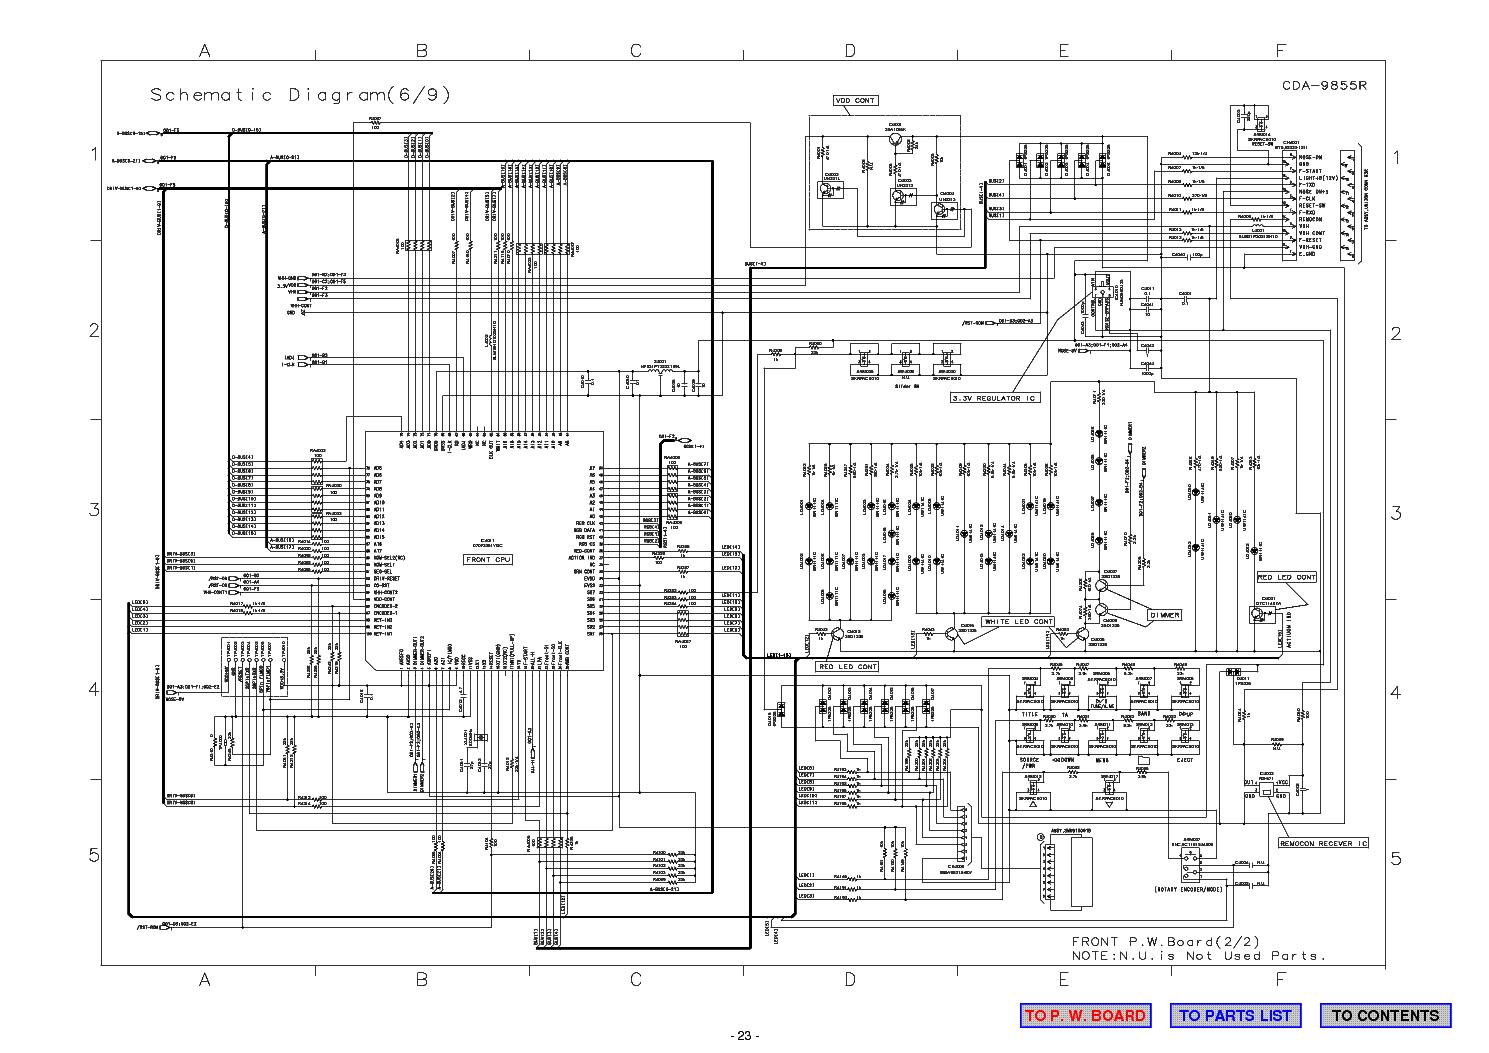 cda 9855 manual Kawasaki Fd D Exmark Wiring Schematic on